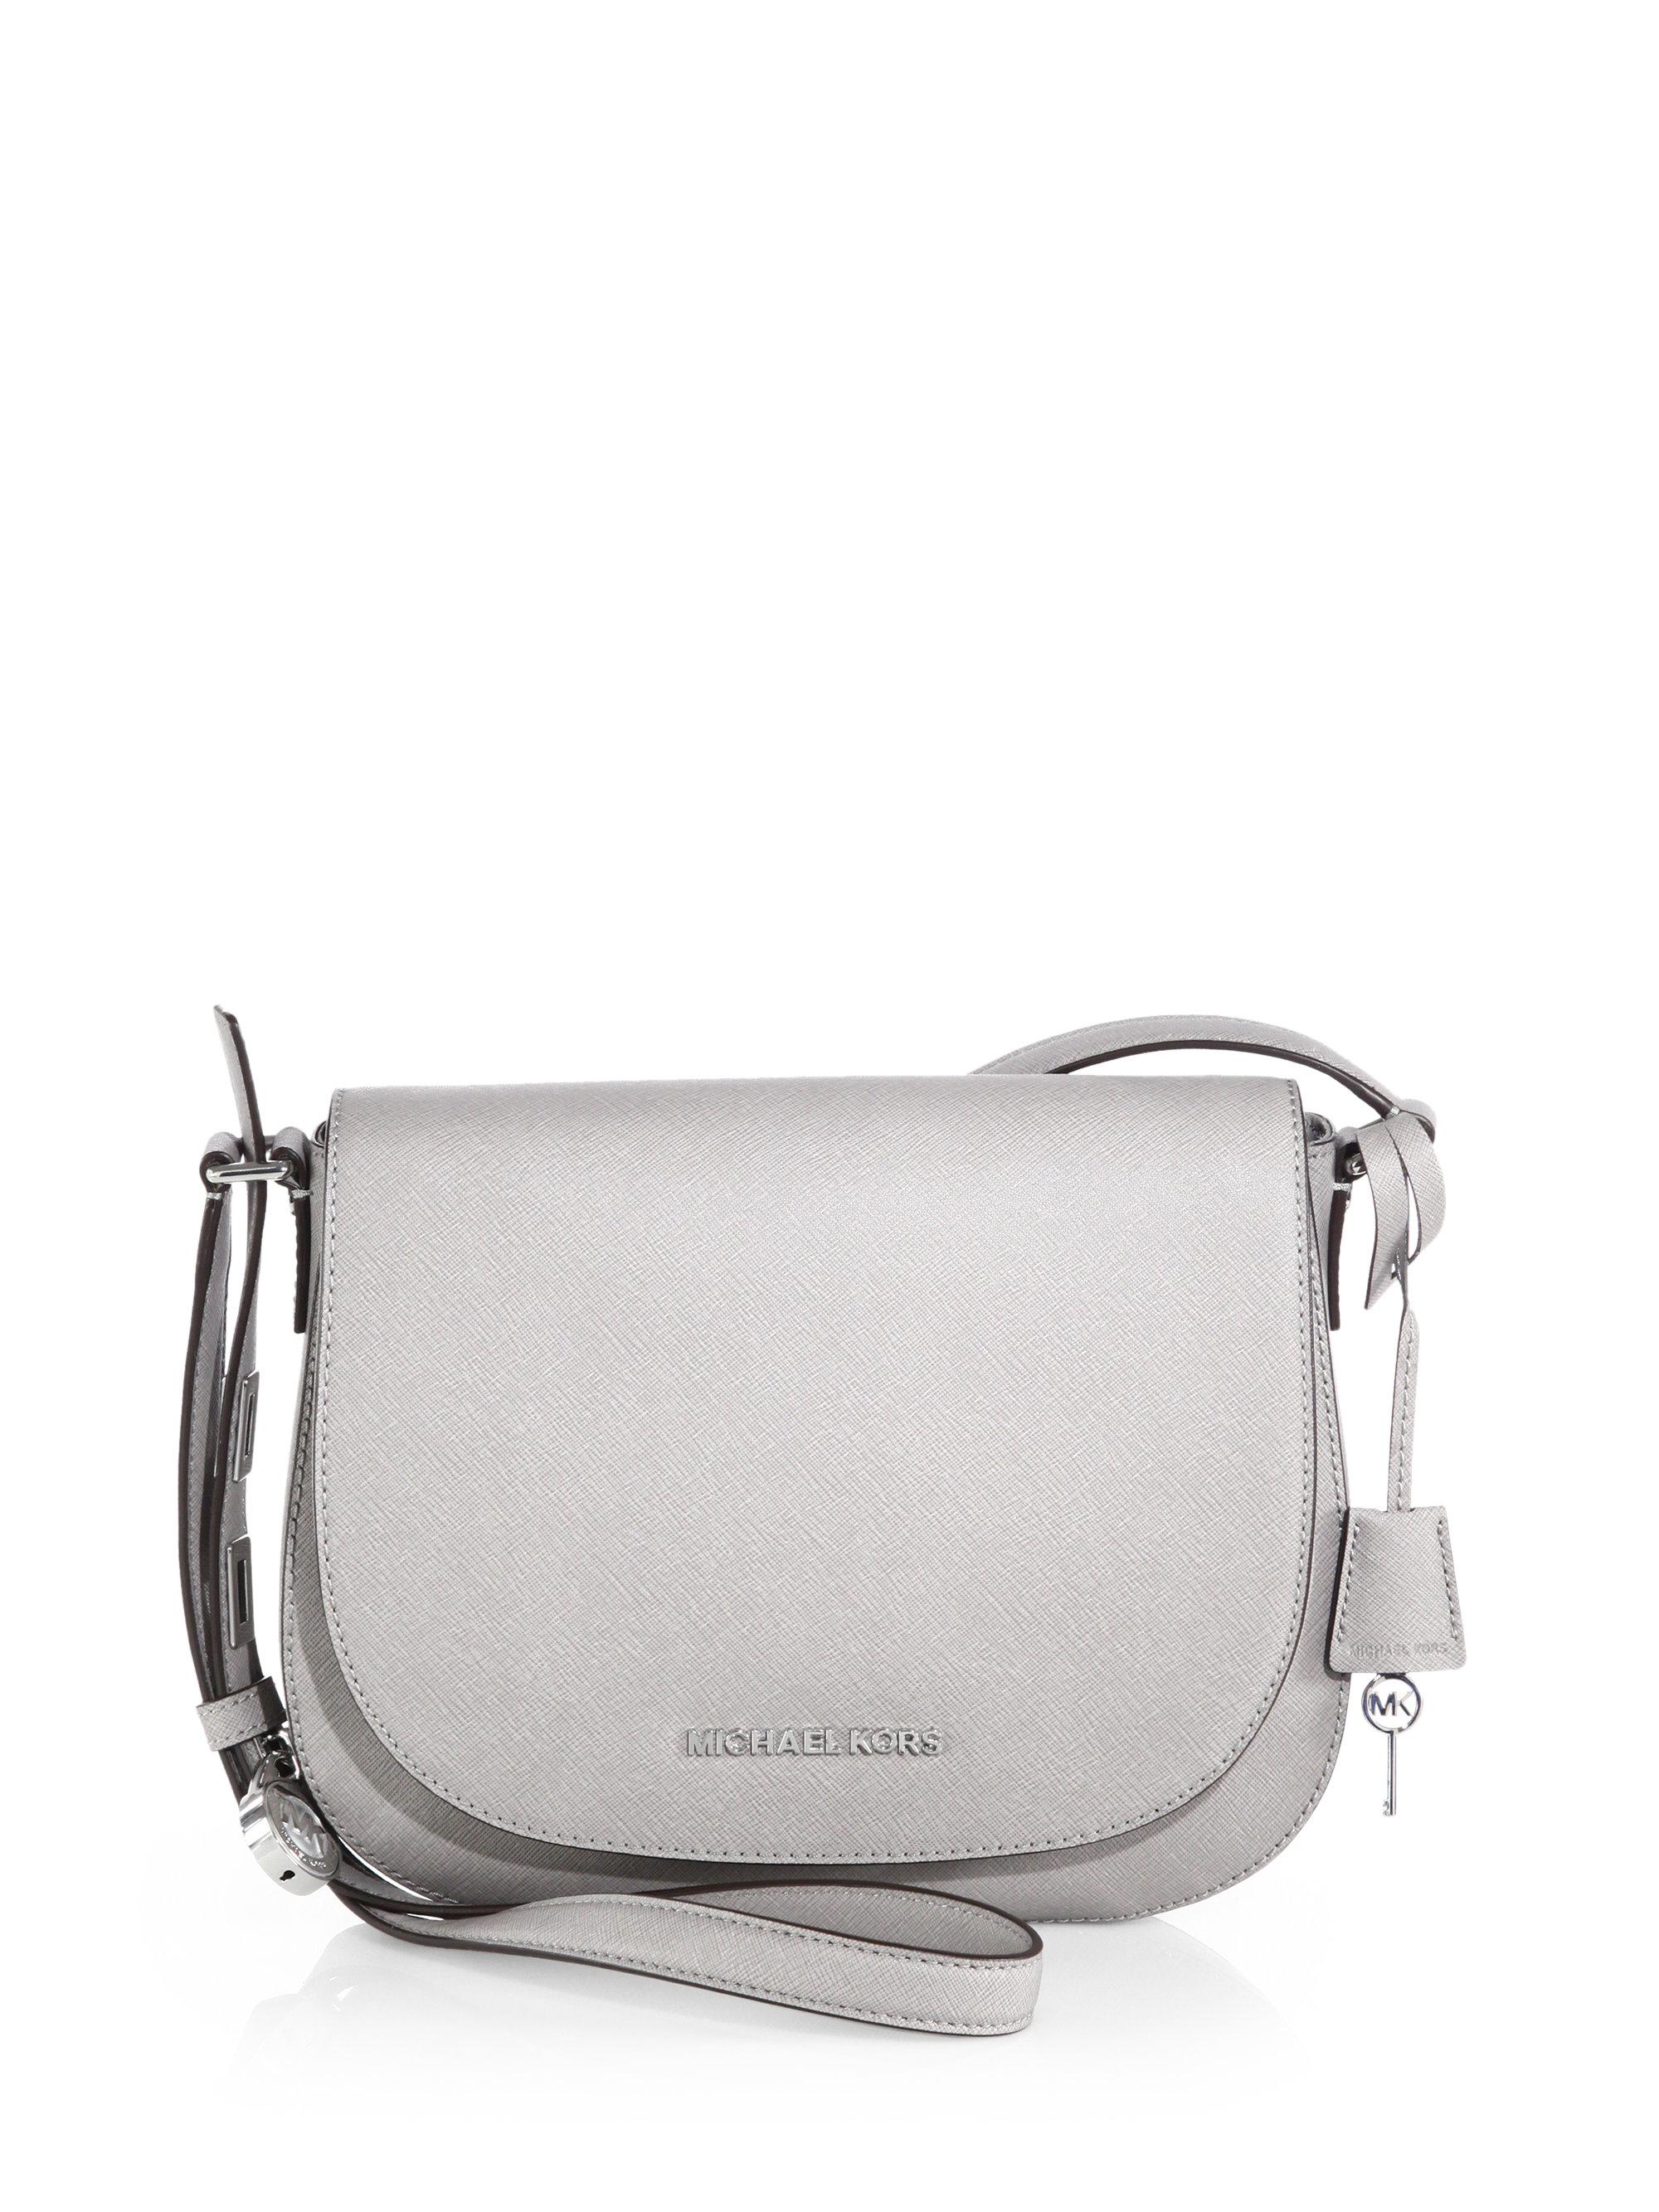 cce5742eff51 MICHAEL Michael Kors Hamilton Large Saffiano Leather Shoulder Bag in ...